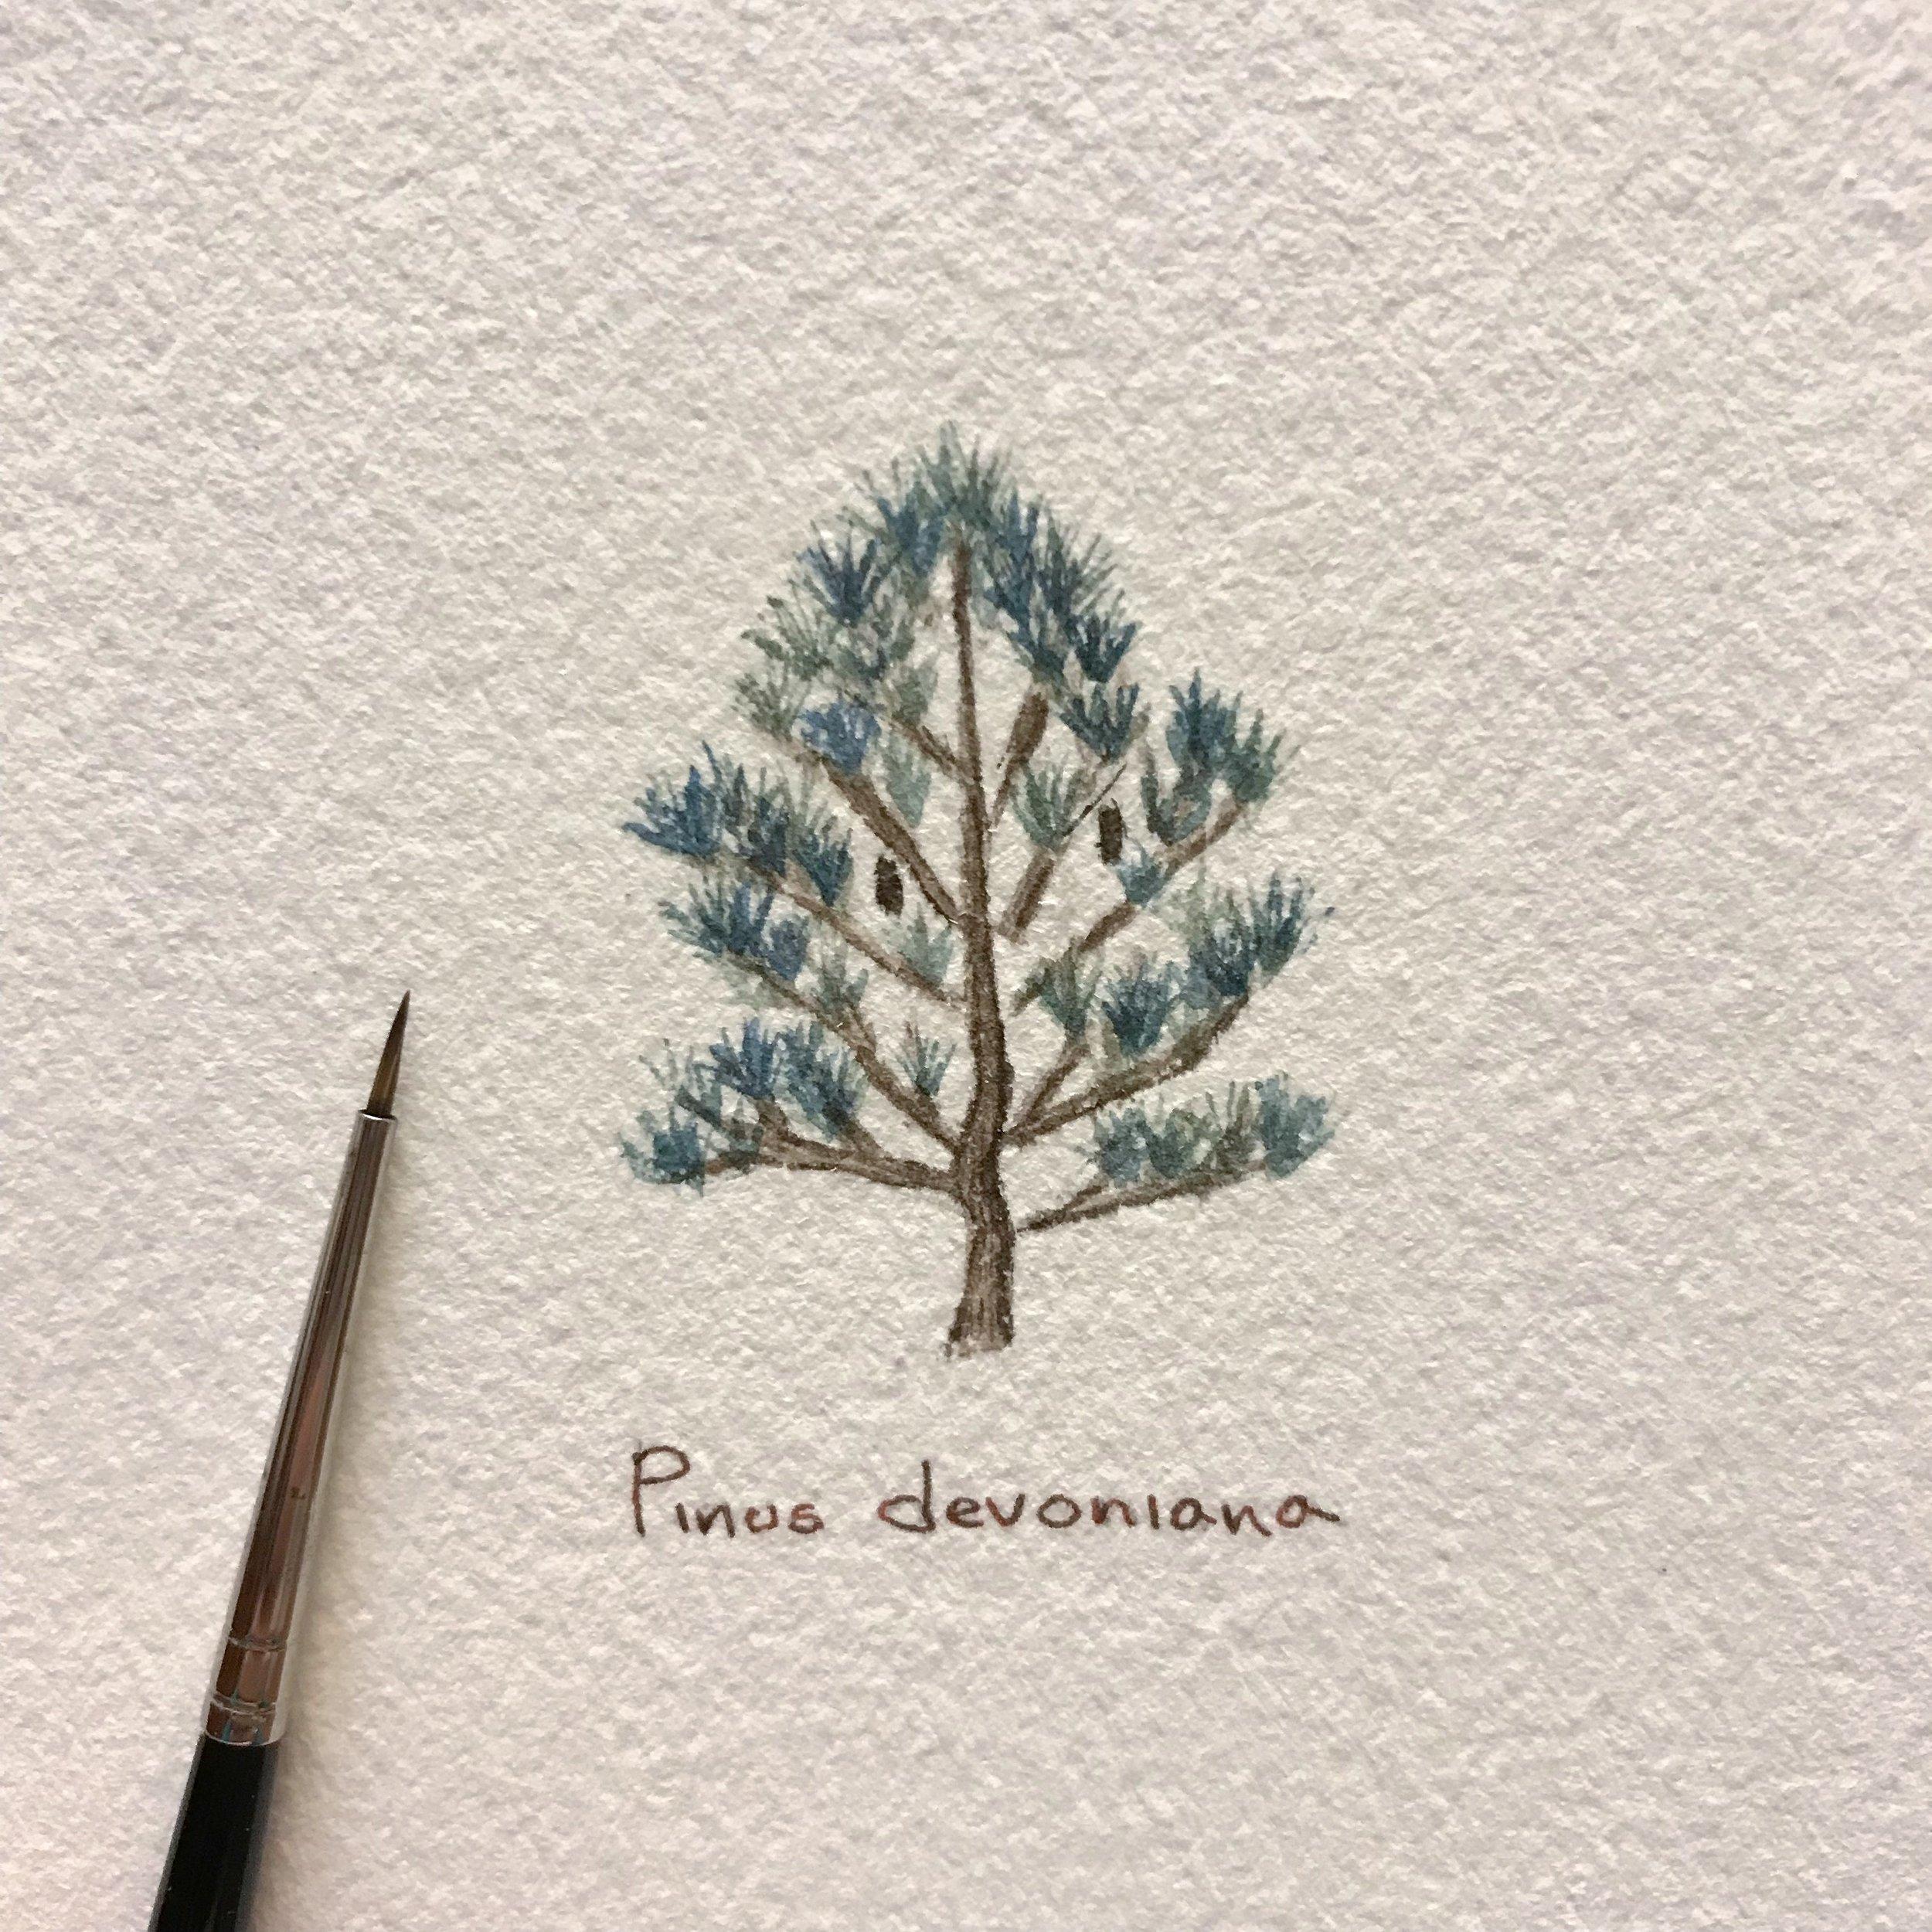 #PlantSaturday: Pinus devoniana